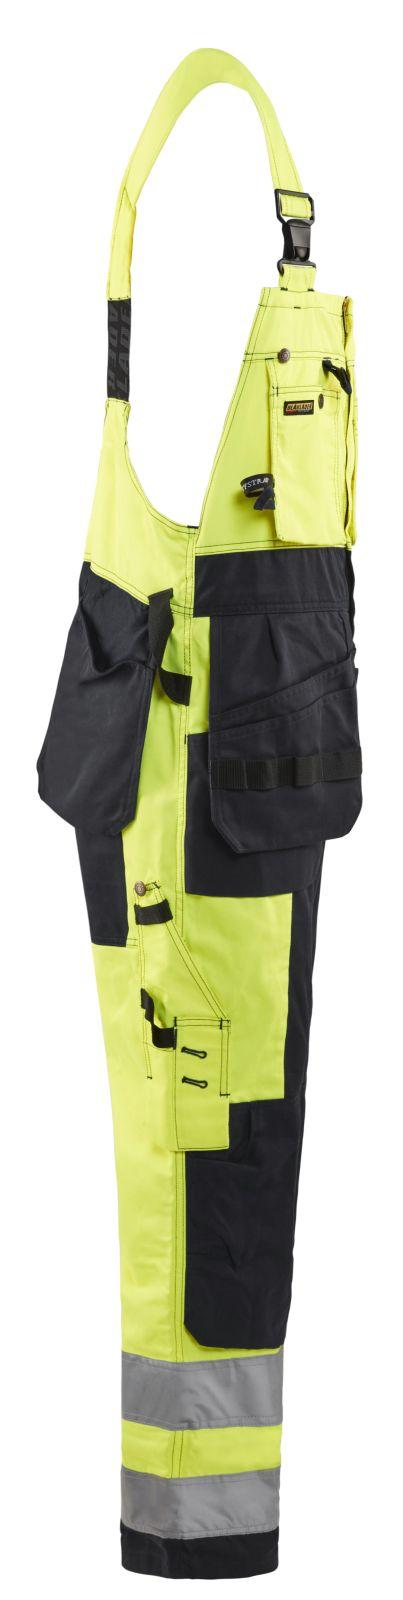 Blaklader Am. Overalls 26031860 High Vis geel-zwart(3399)